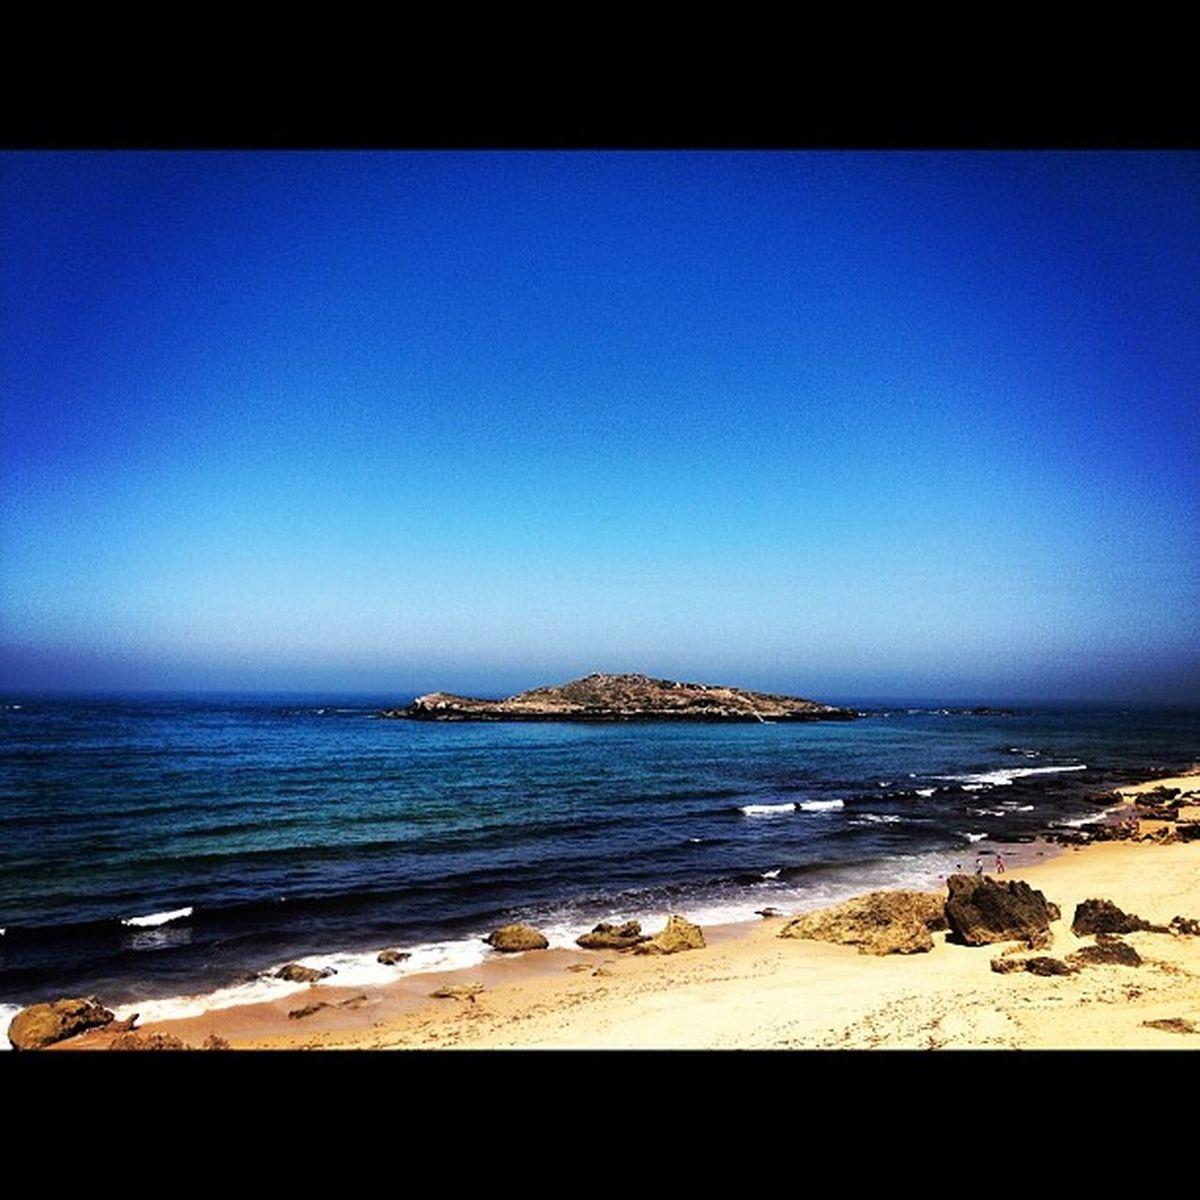 #island #ilhadopessegueiro #ilha #odemira #portocovo #beach #praia #costaalentejana #iphone4s #instagood #instagram #instalove #iphonesia #instamania #popular #portugal #portugaldenorteasul #holidays #sun #summer Popular Portugal Iphonesia Instagram Instagood Instamania Instalove Summer Ilha Beach Portugaldenorteasul Sun Odemira Costaalentejana Holidays Portocovo IPhone4s Island Praia Ilhadopessegueiro